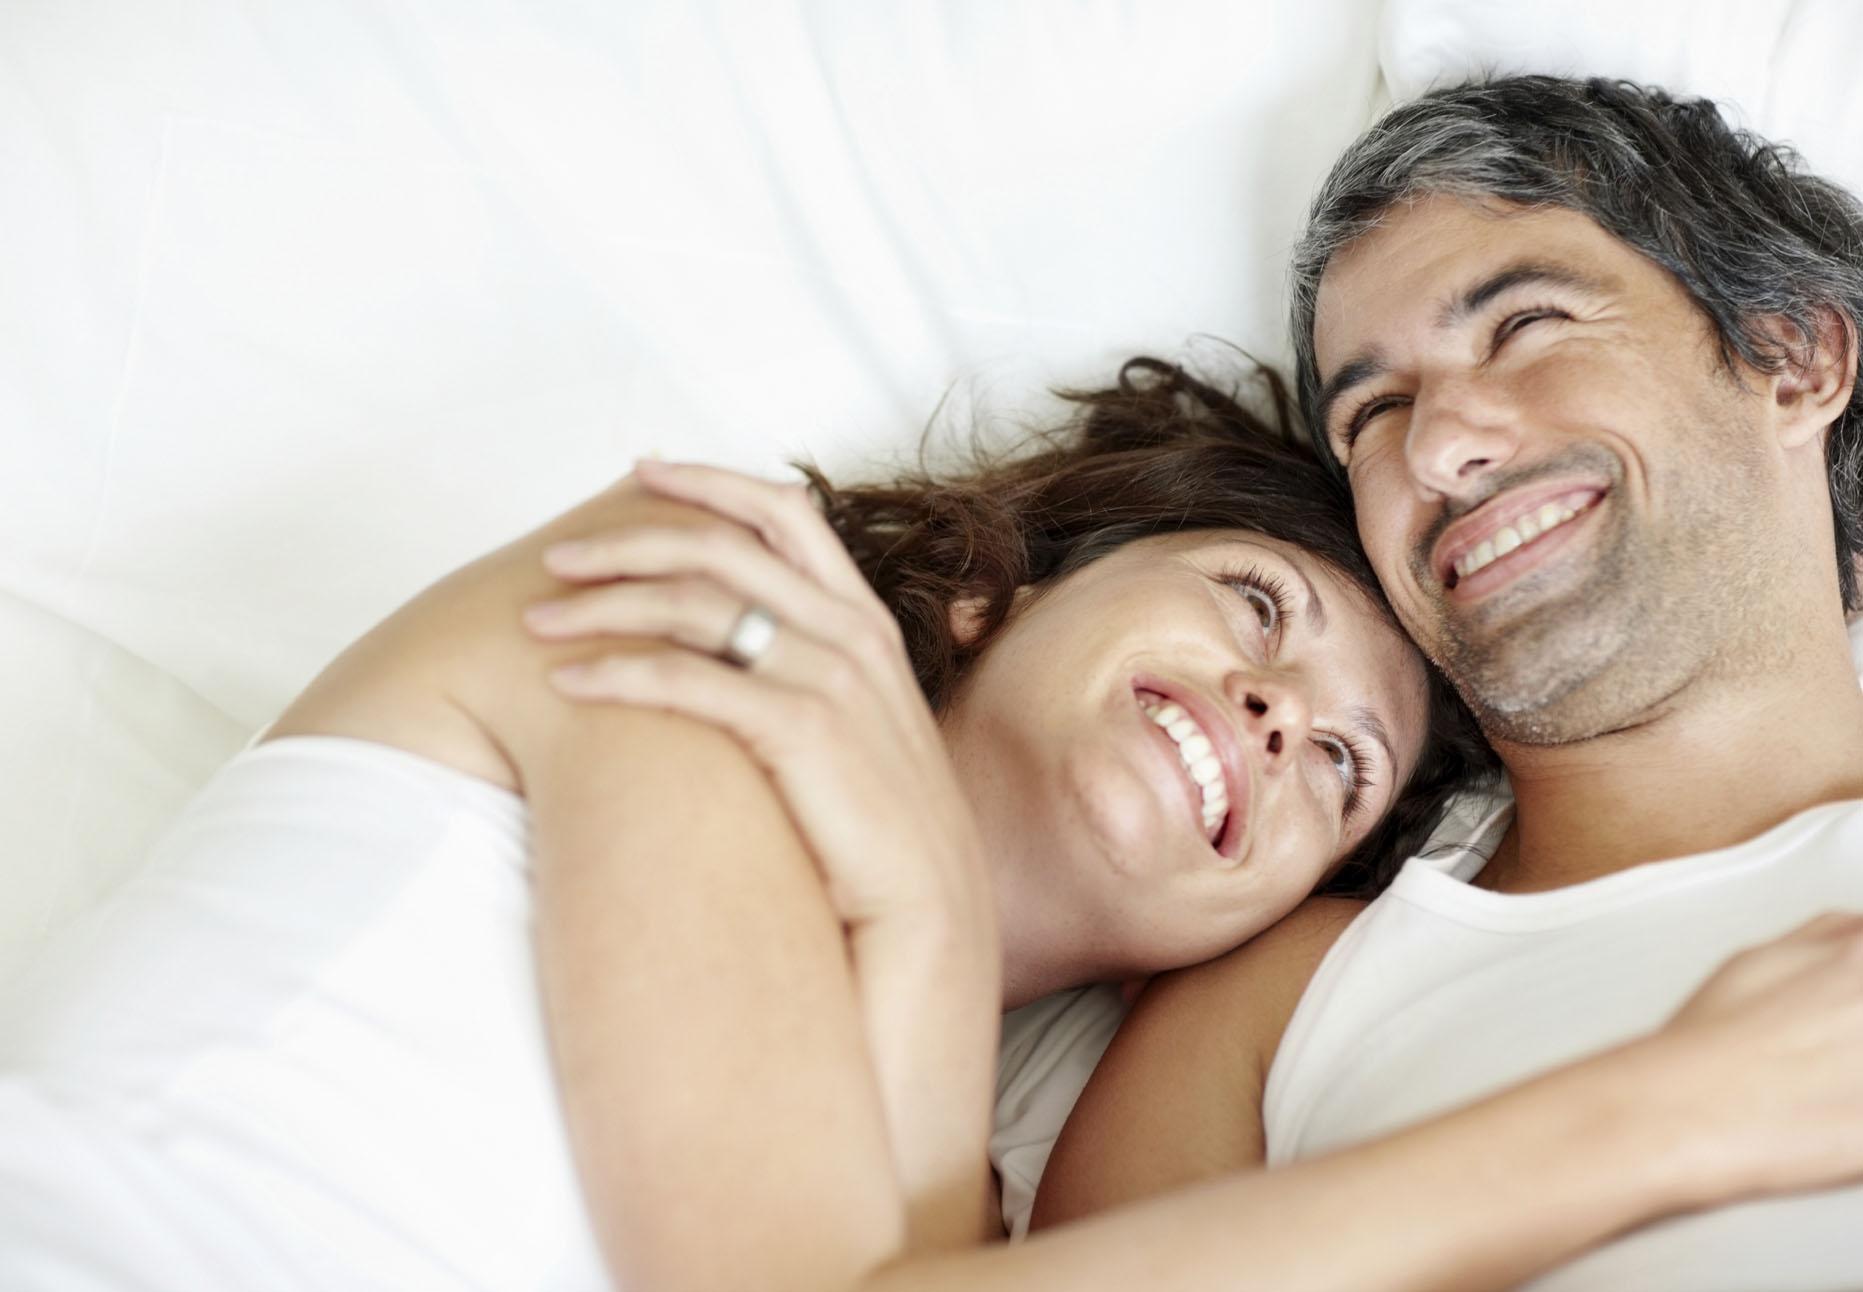 hot couple hard sex in night